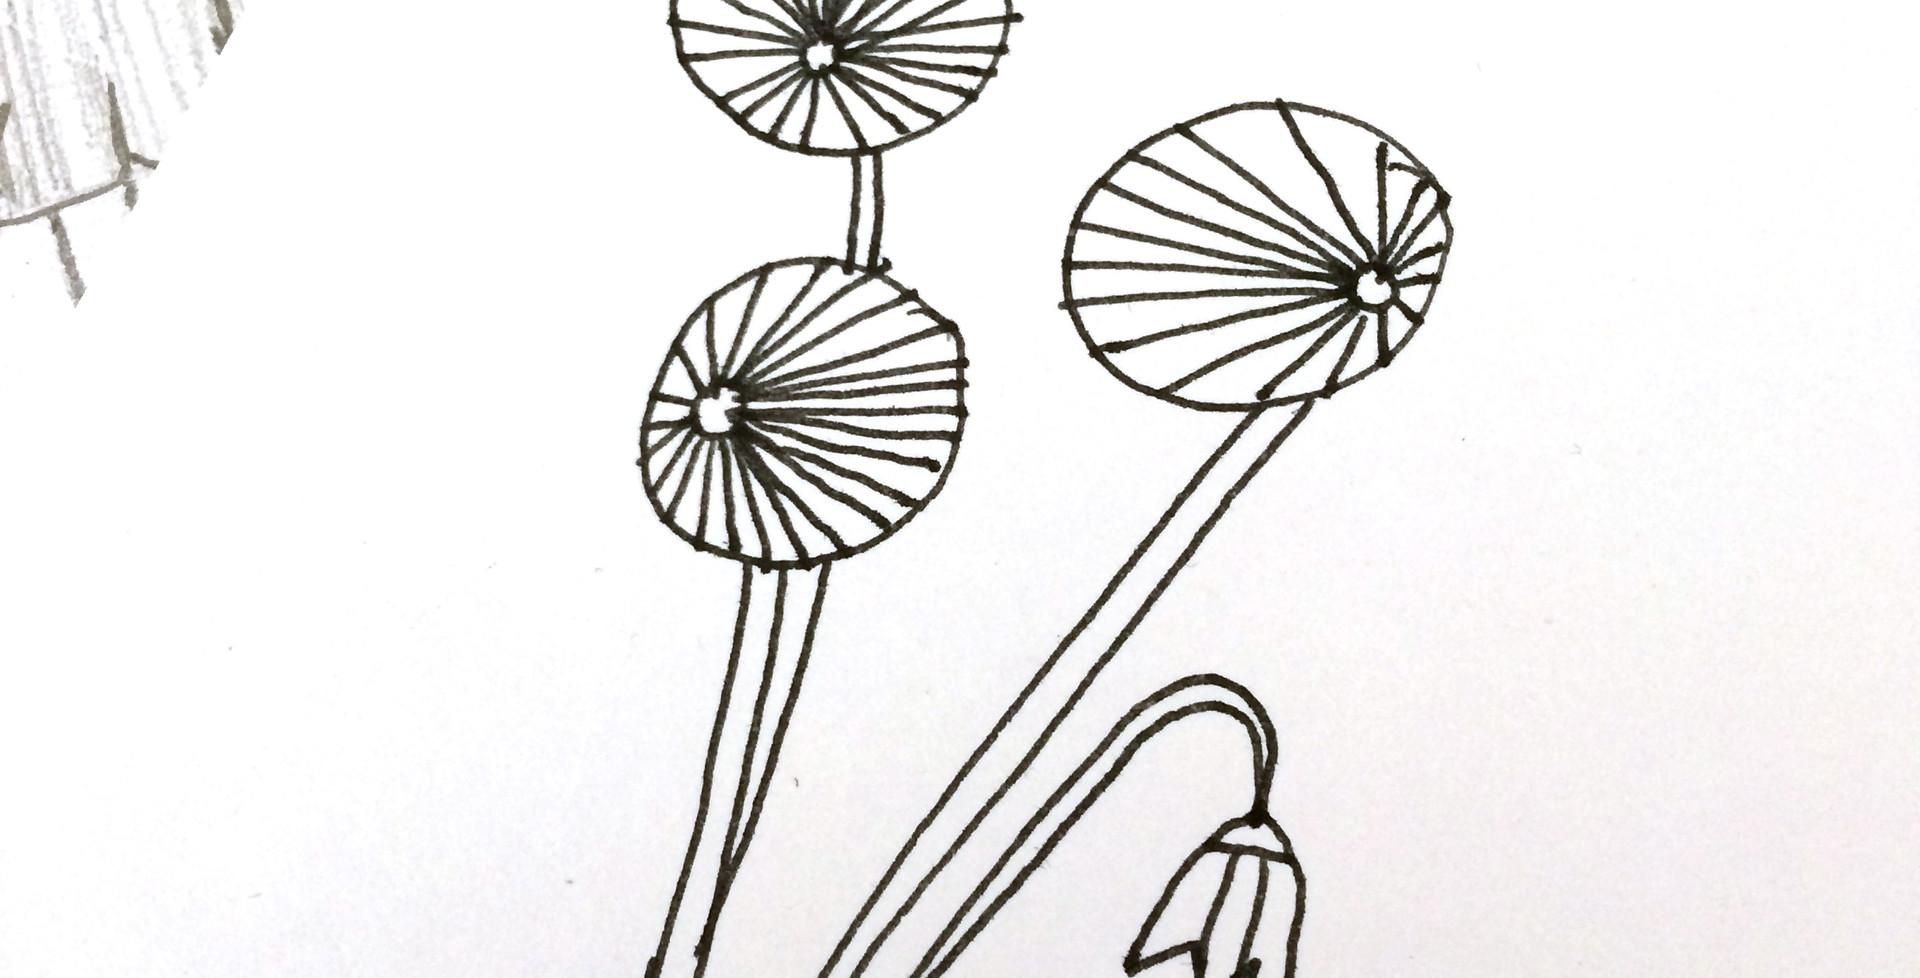 Sketchbook Page 25